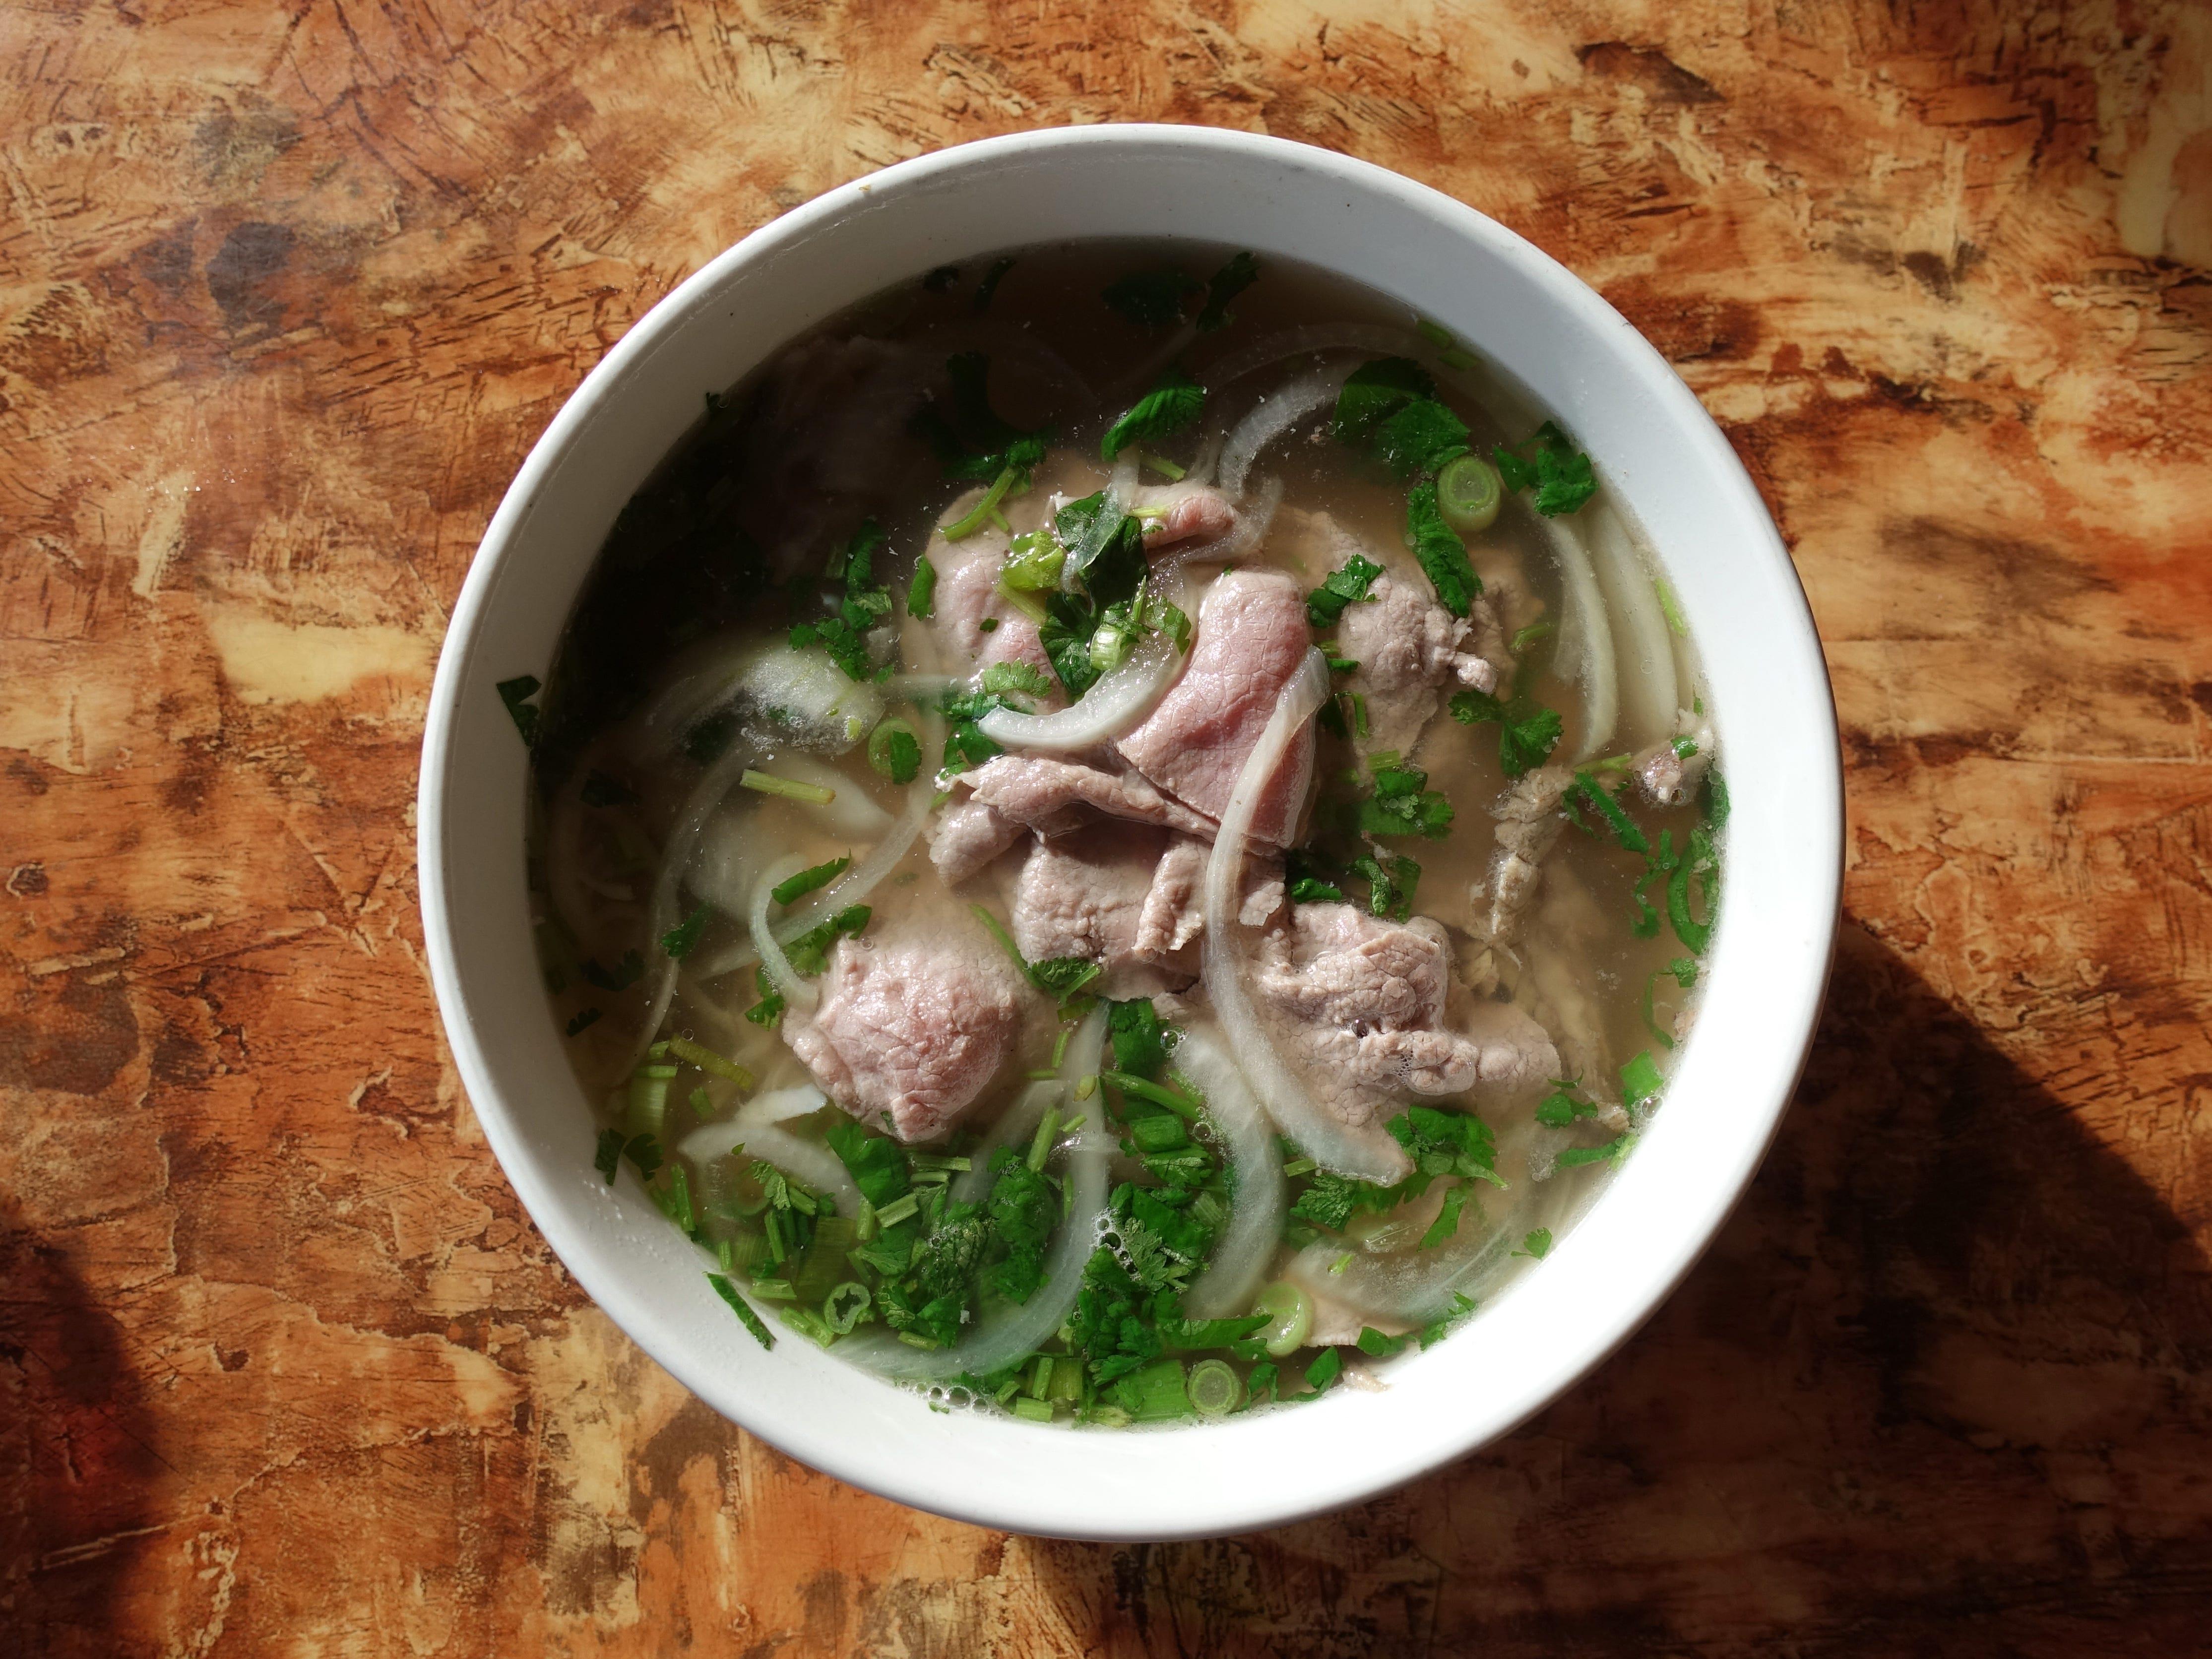 Pho Thuan Thanh at Pho Thuan Thanh in Mesa.